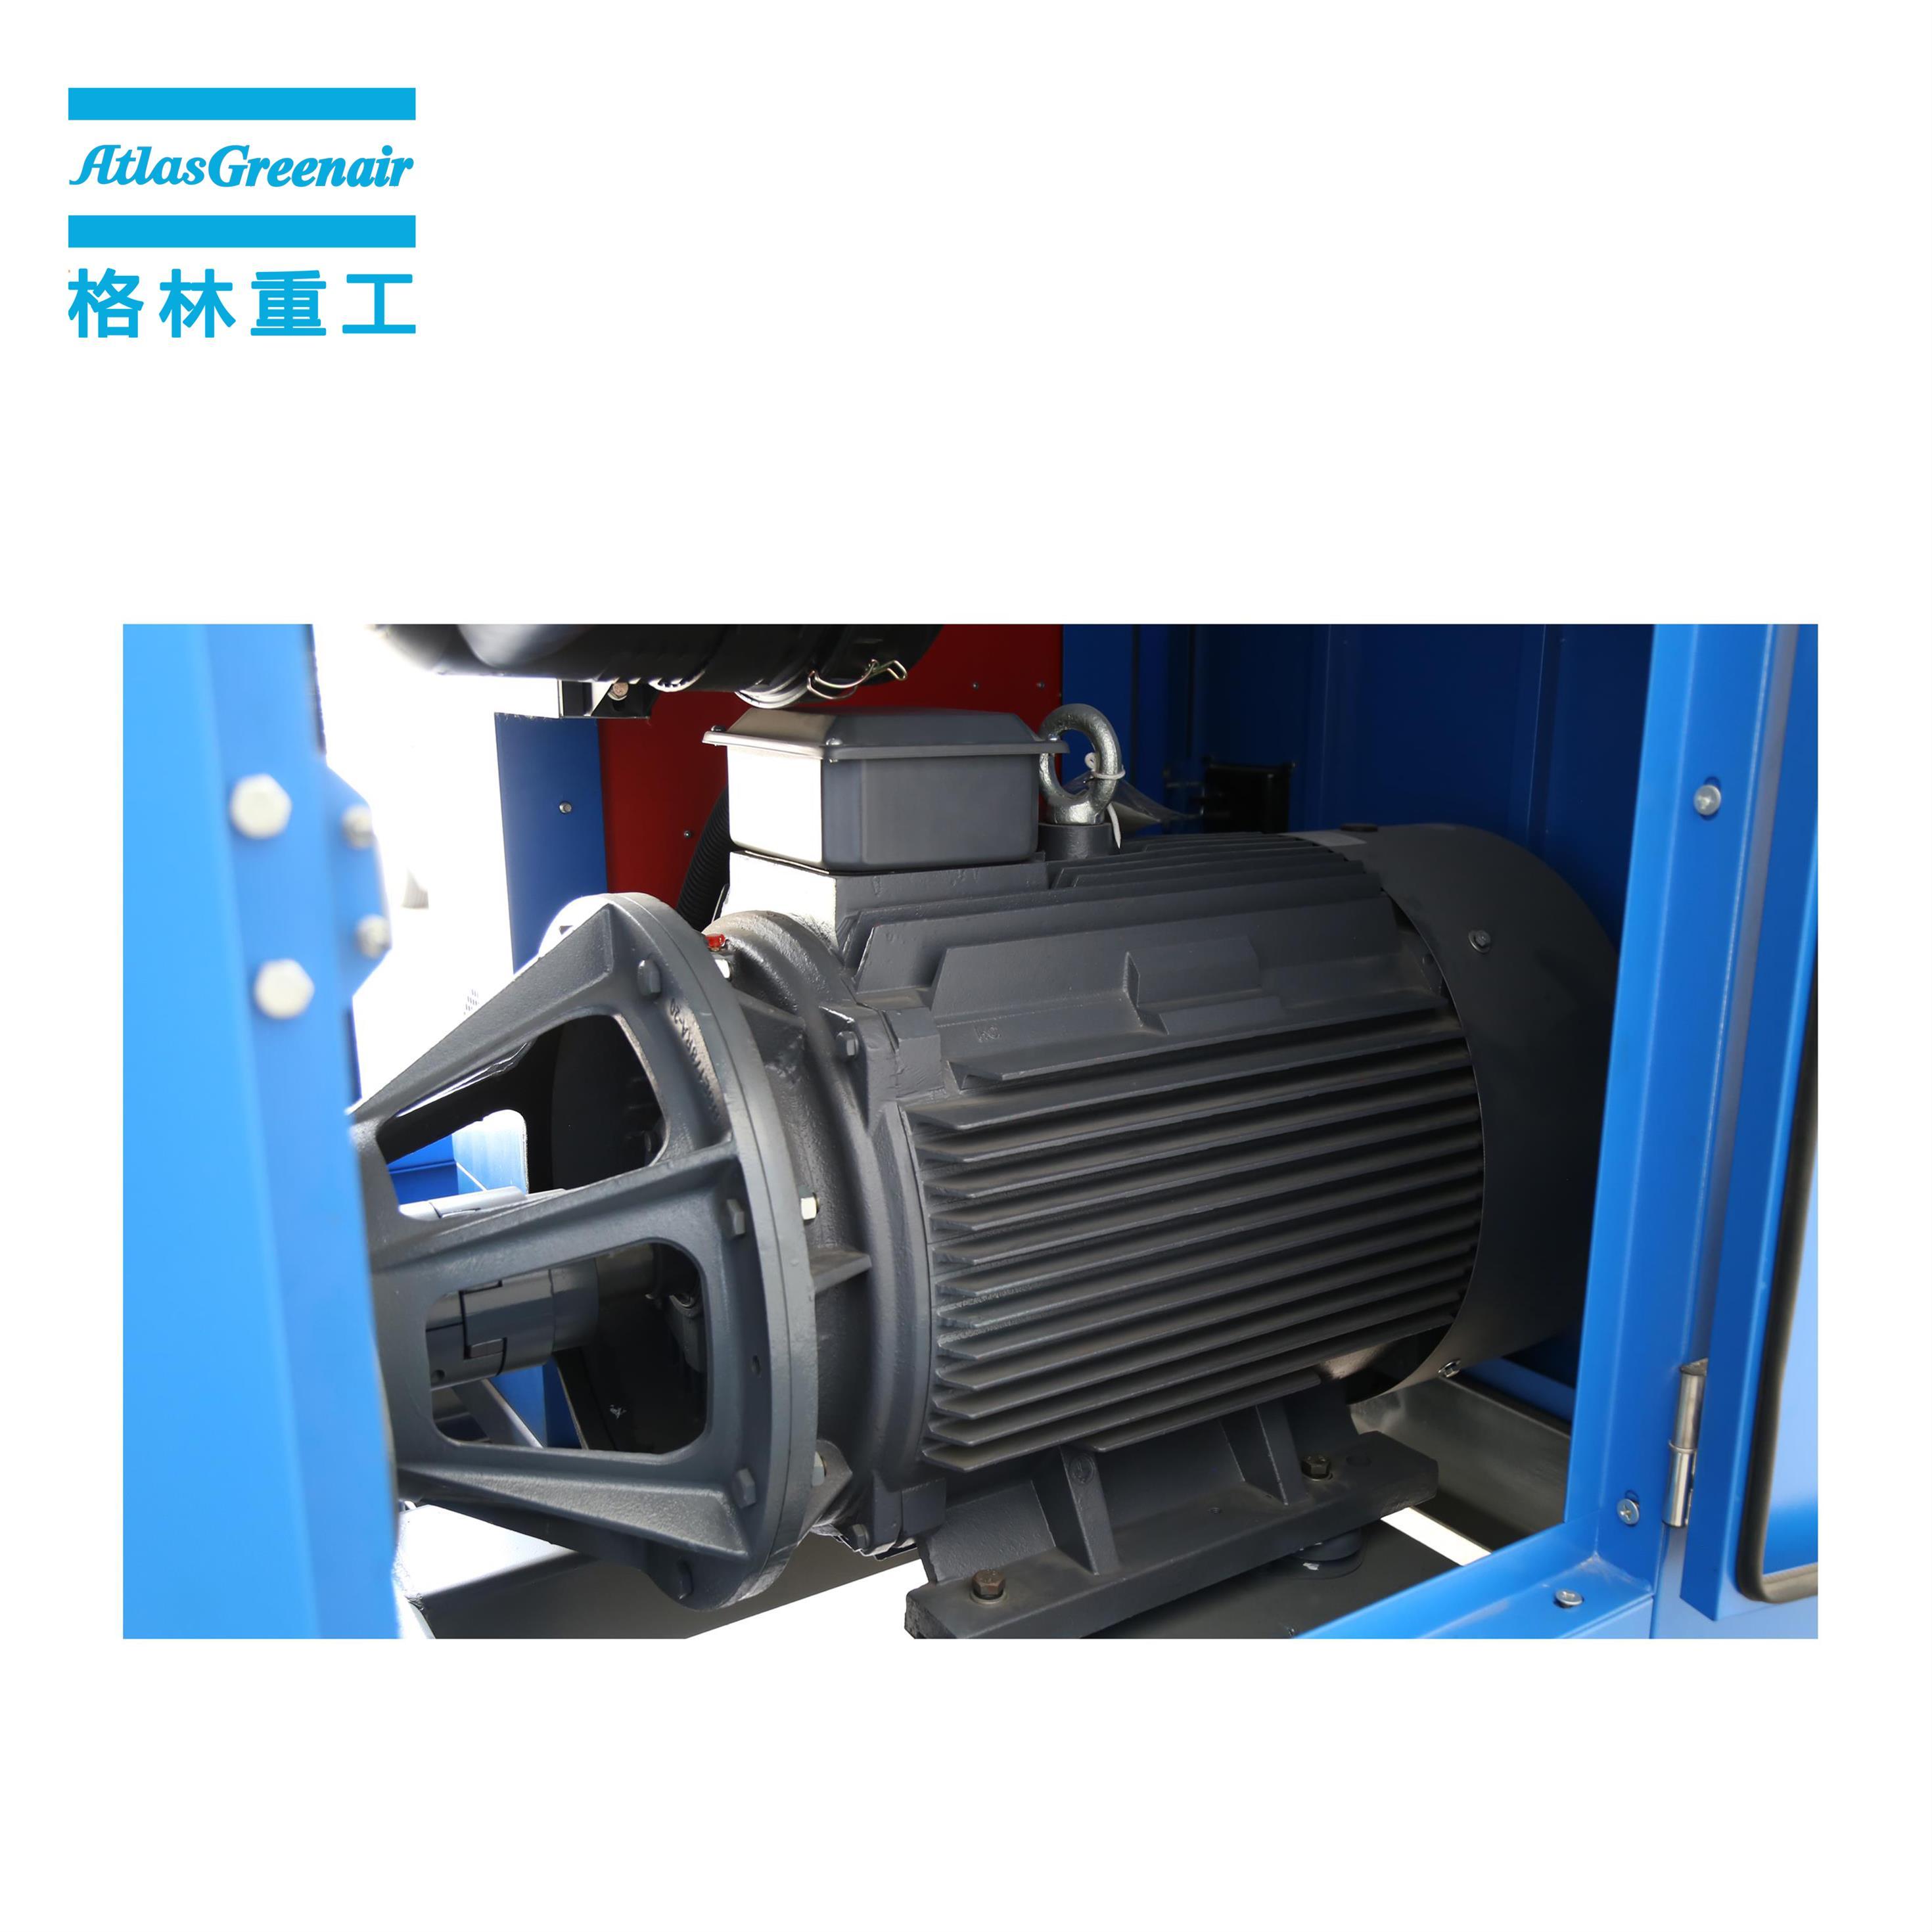 Atlas Greenair Screw Air Compressor portable screw compressor with intelligent control system wholesale-2